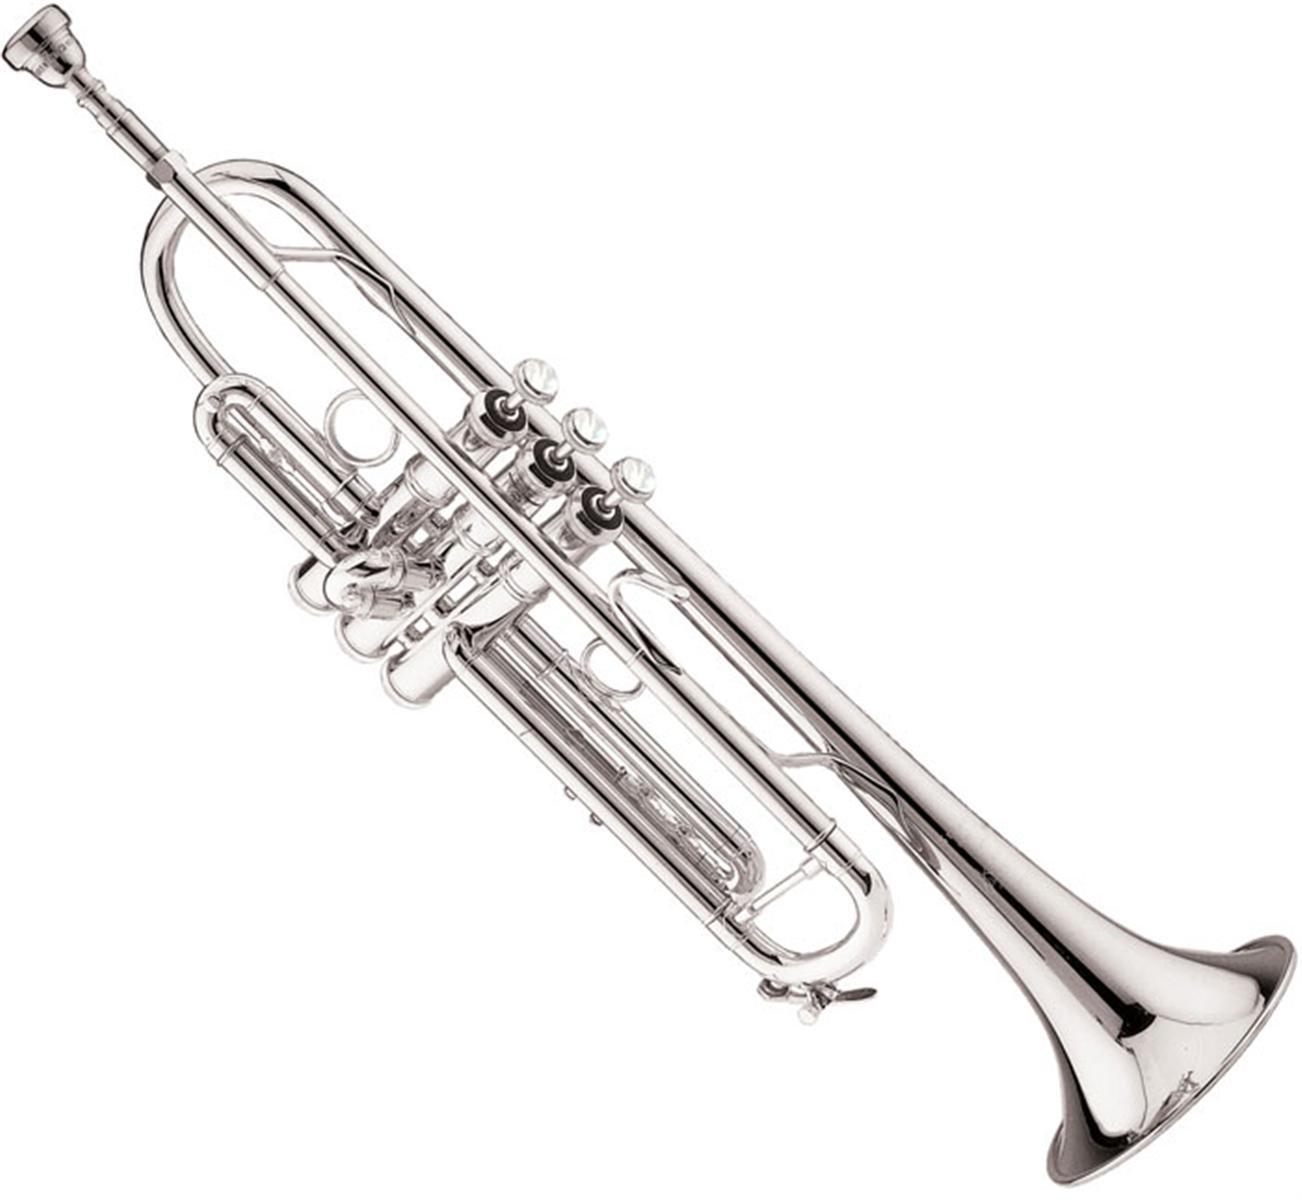 BACH LT180S77 Professional Bb Trumpet